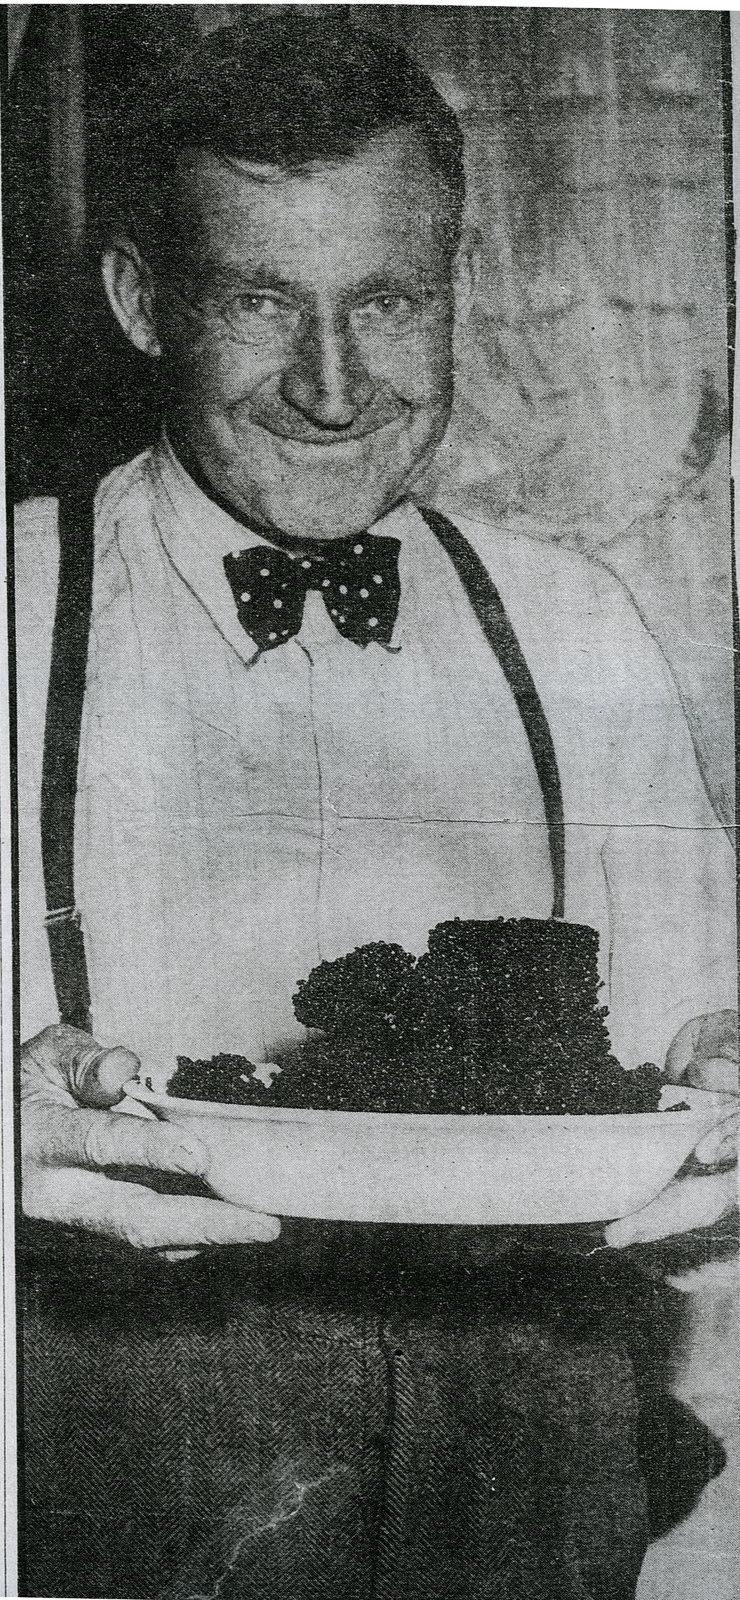 Roy Cockburn, le roi du caviar / Roy Cockburn, the Caviar King